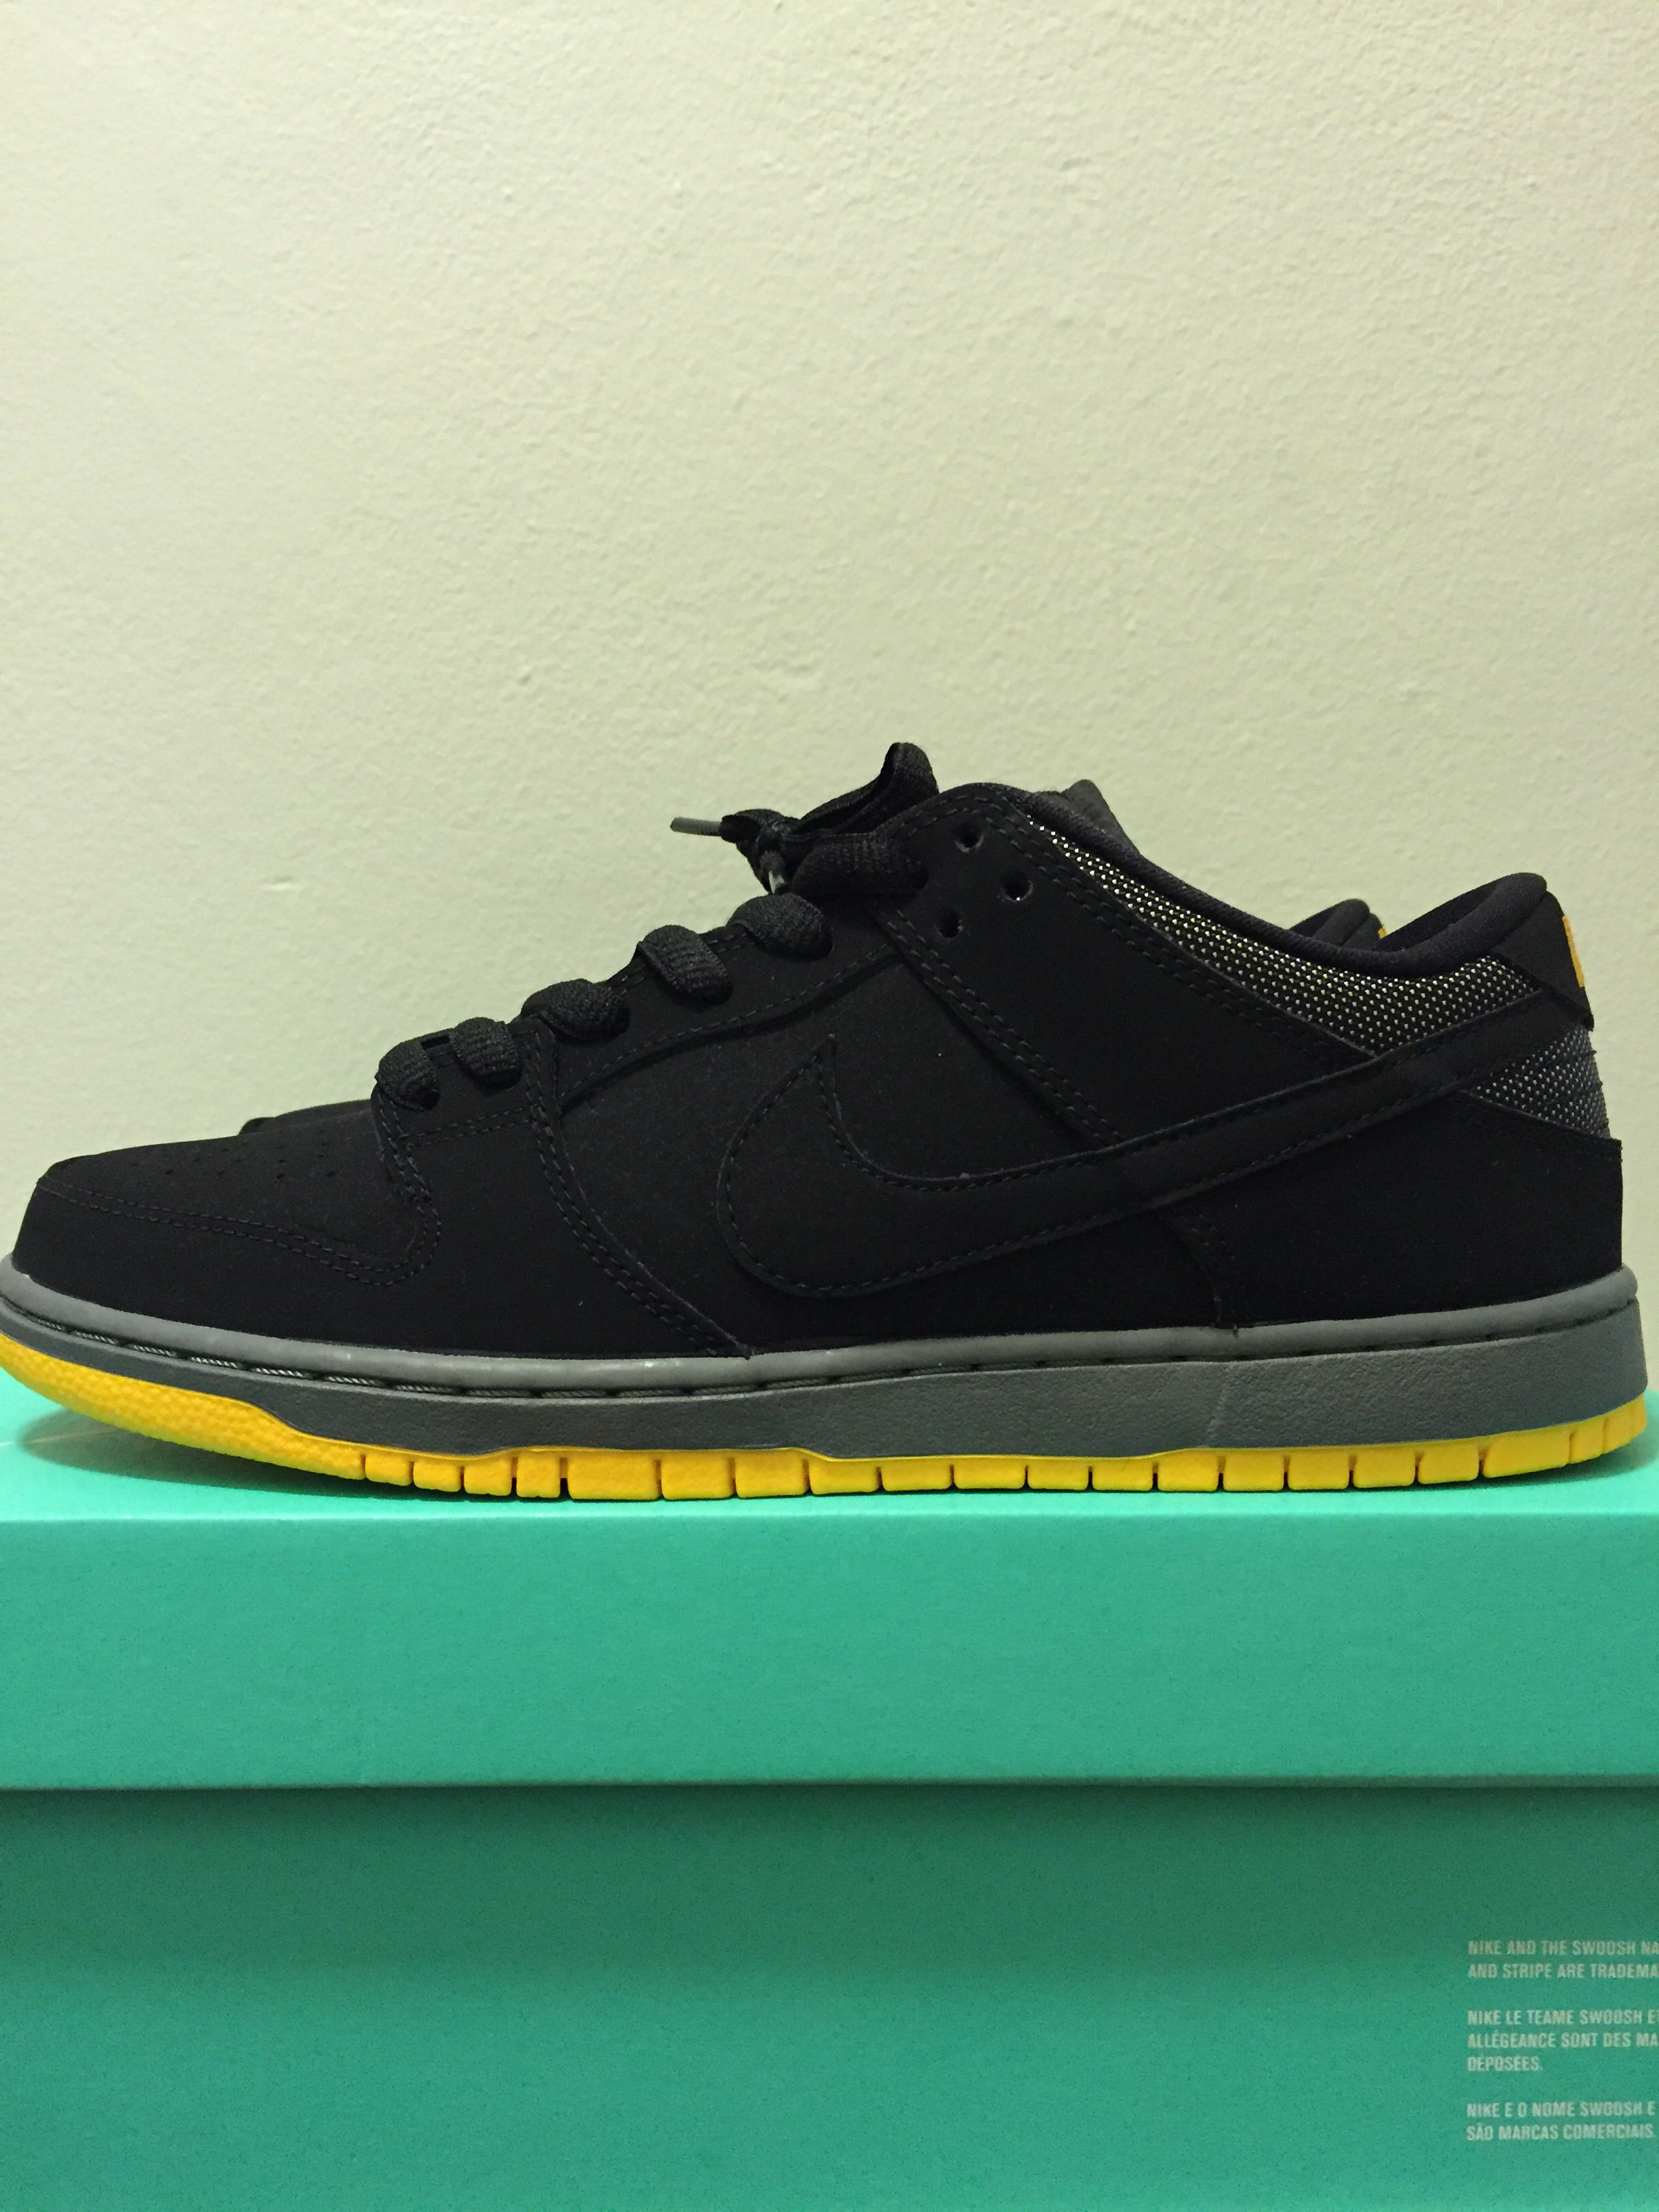 low priced 871f9 31f34 Nike sb dunk low